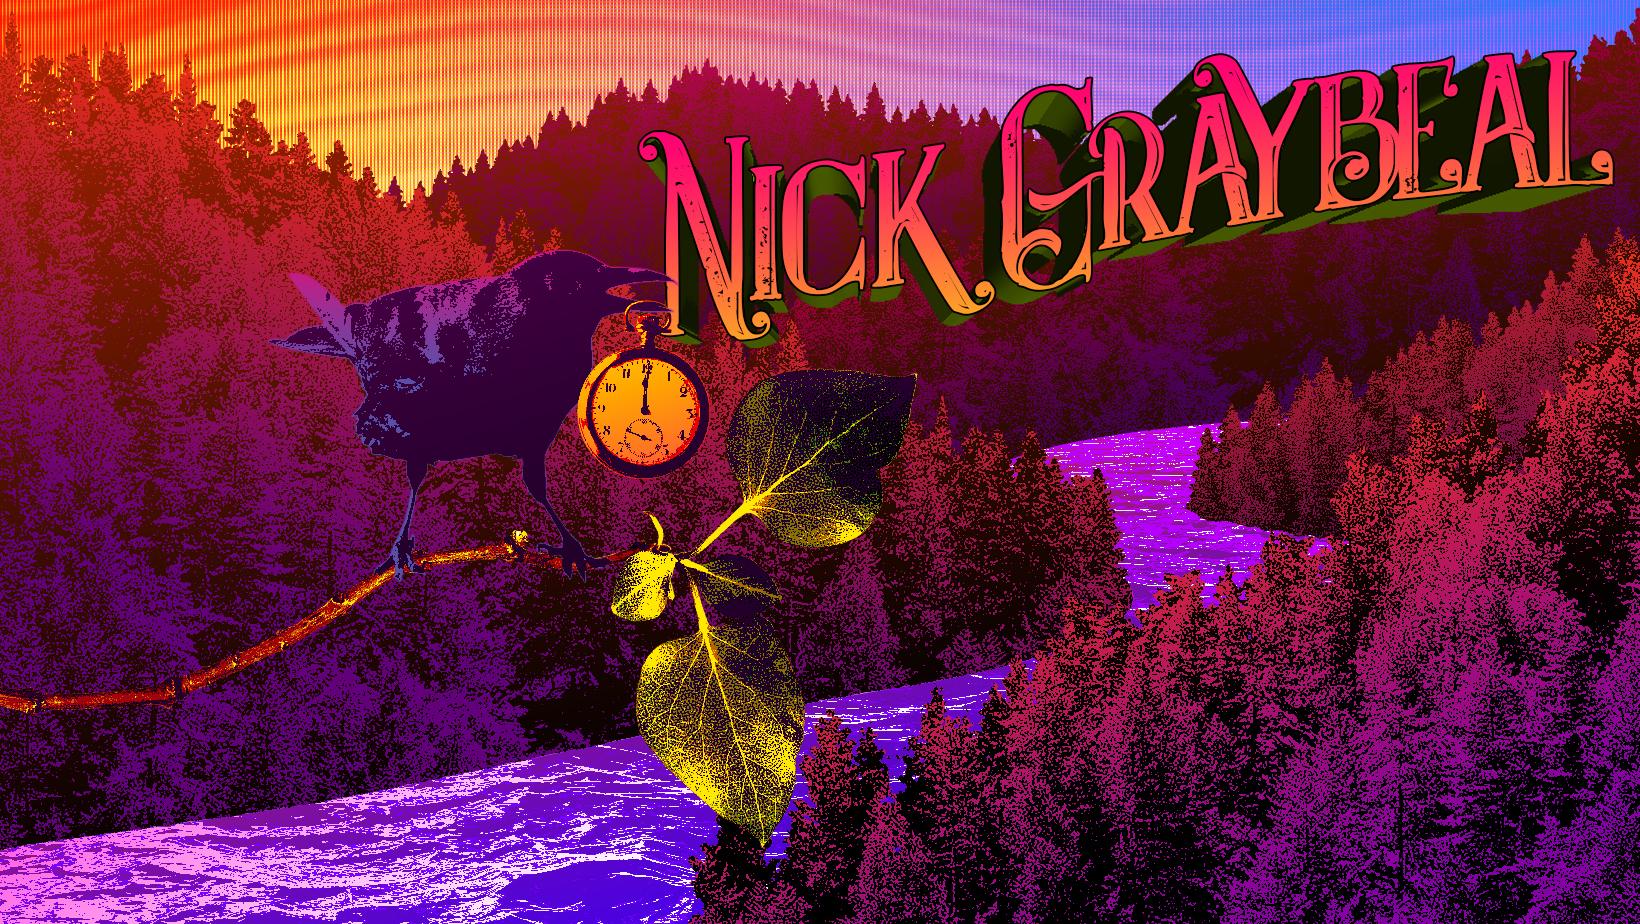 Nick Graybeal